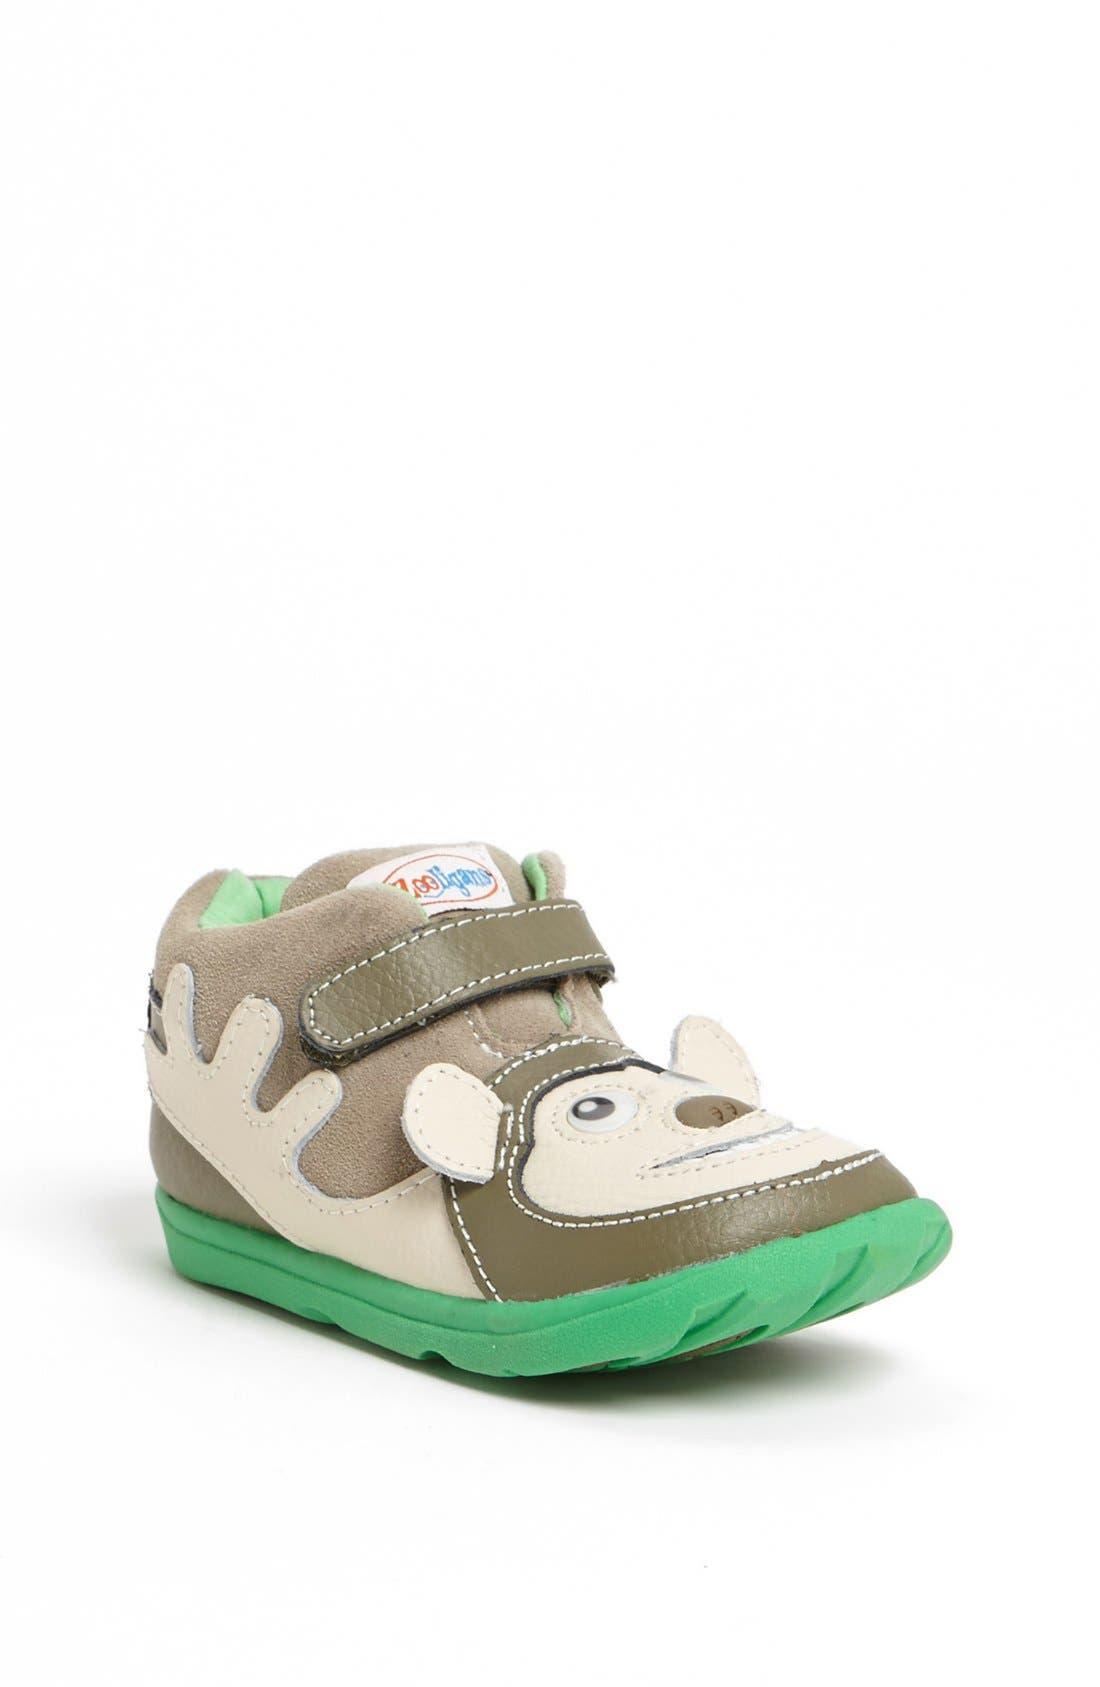 Alternate Image 1 Selected - Zooligans™ 'Bobo the Monkey' Sneaker (Baby, Walker, Toddler & Little Kid)